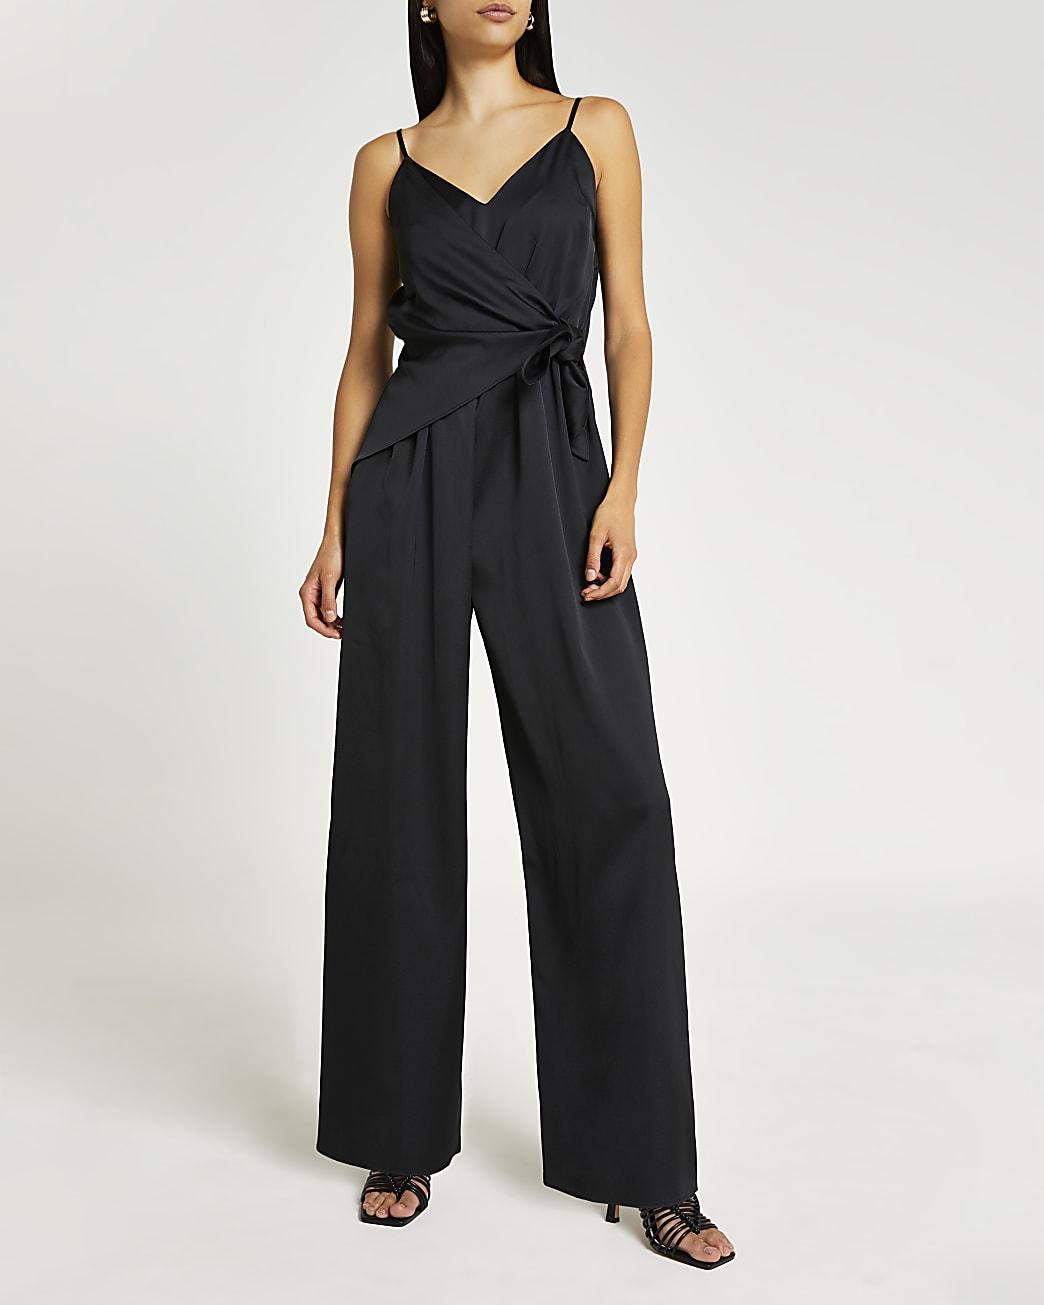 Black tie waist jumpsuit